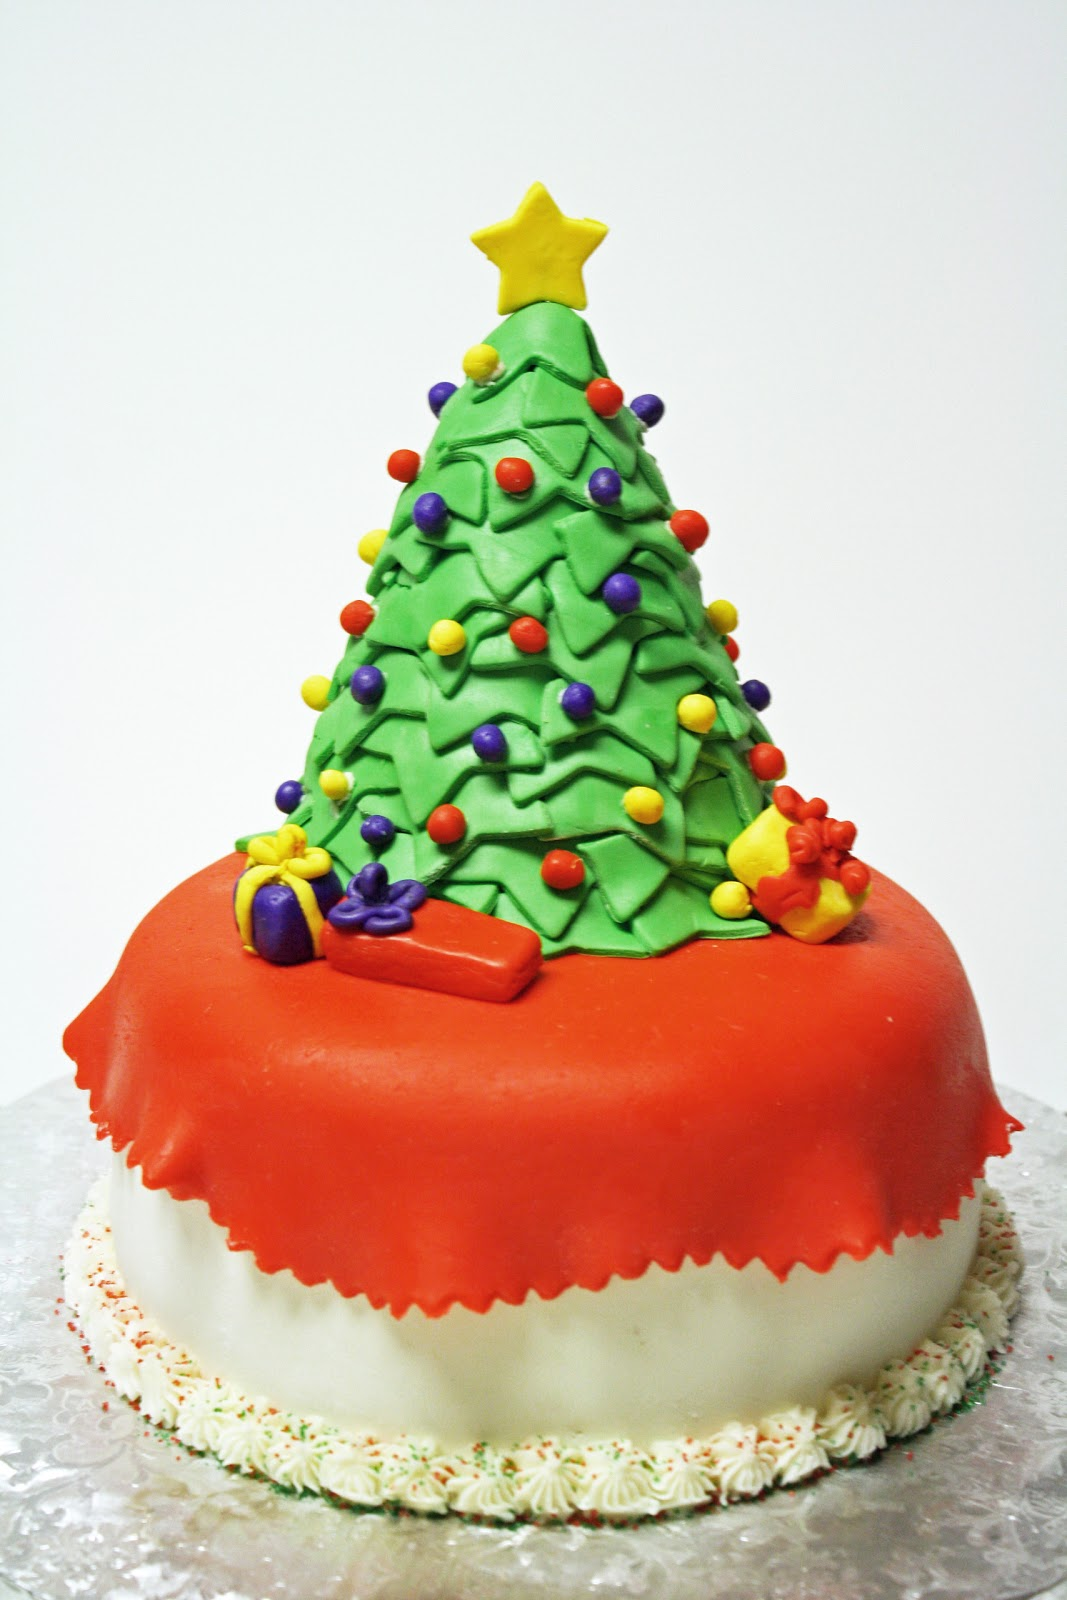 Images Of Christmas Tree Cake : Christmas Tree Cake